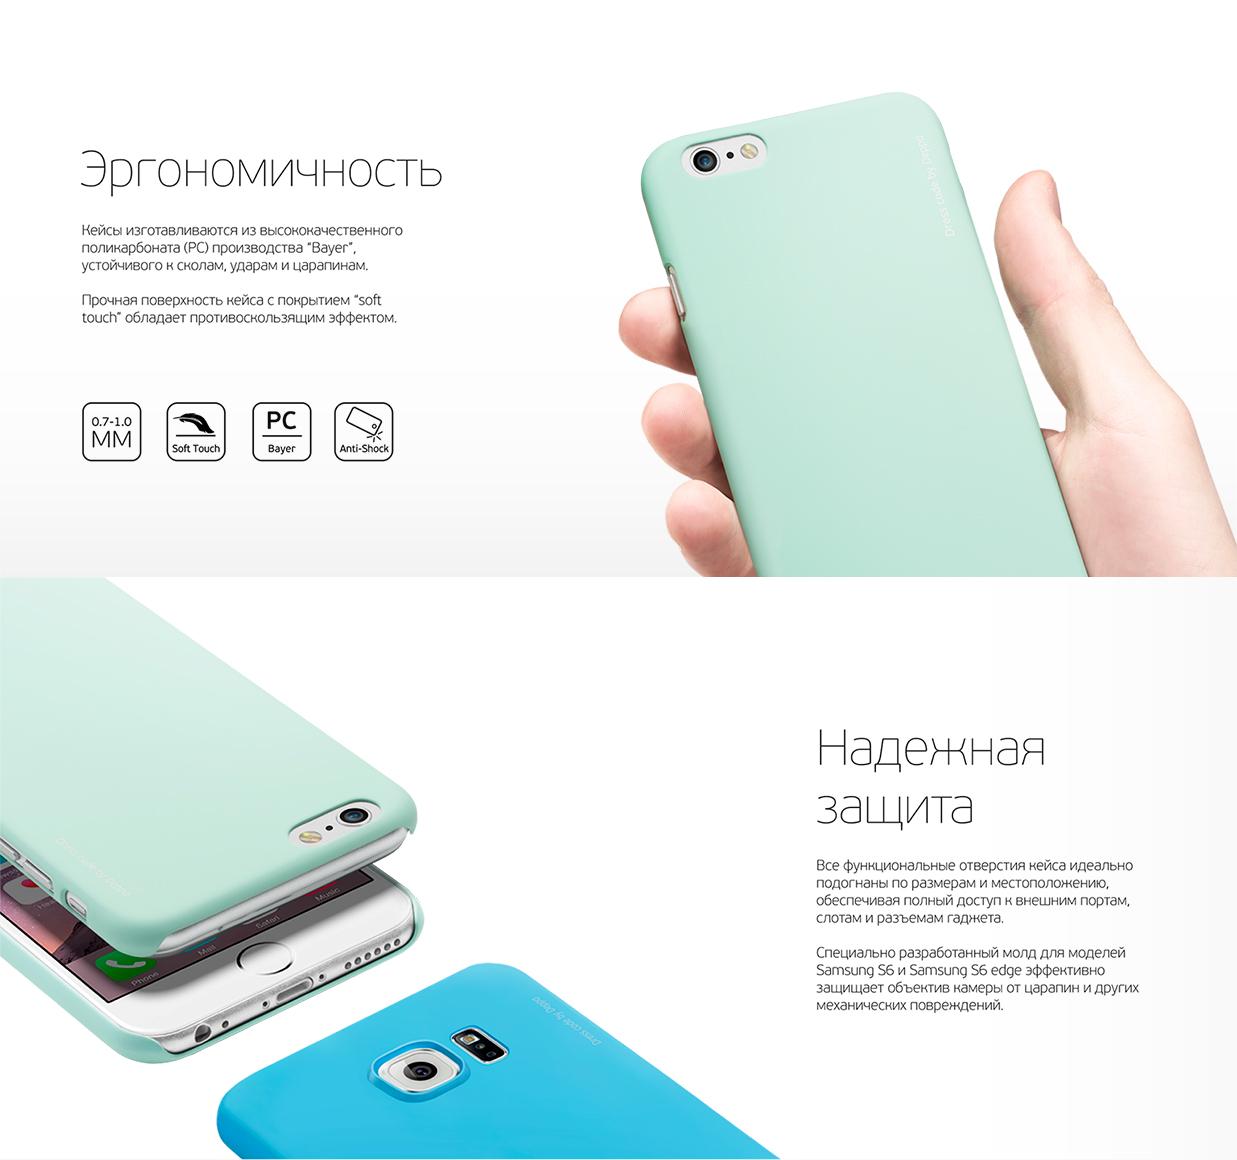 Чехол Air Case для Samsung Galaxy S3